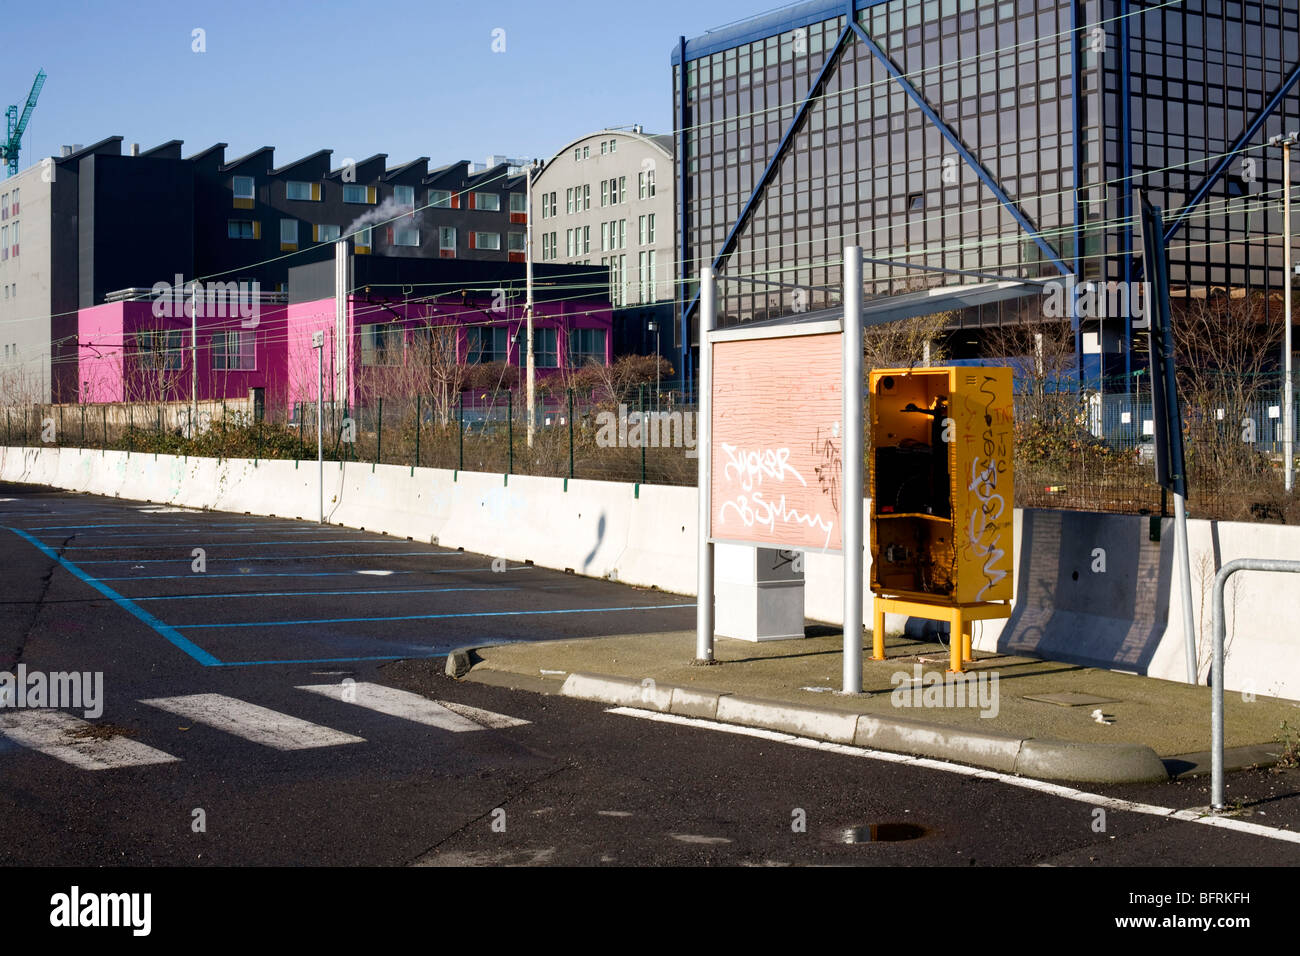 Urban scenes Milan Italy - Stock Image